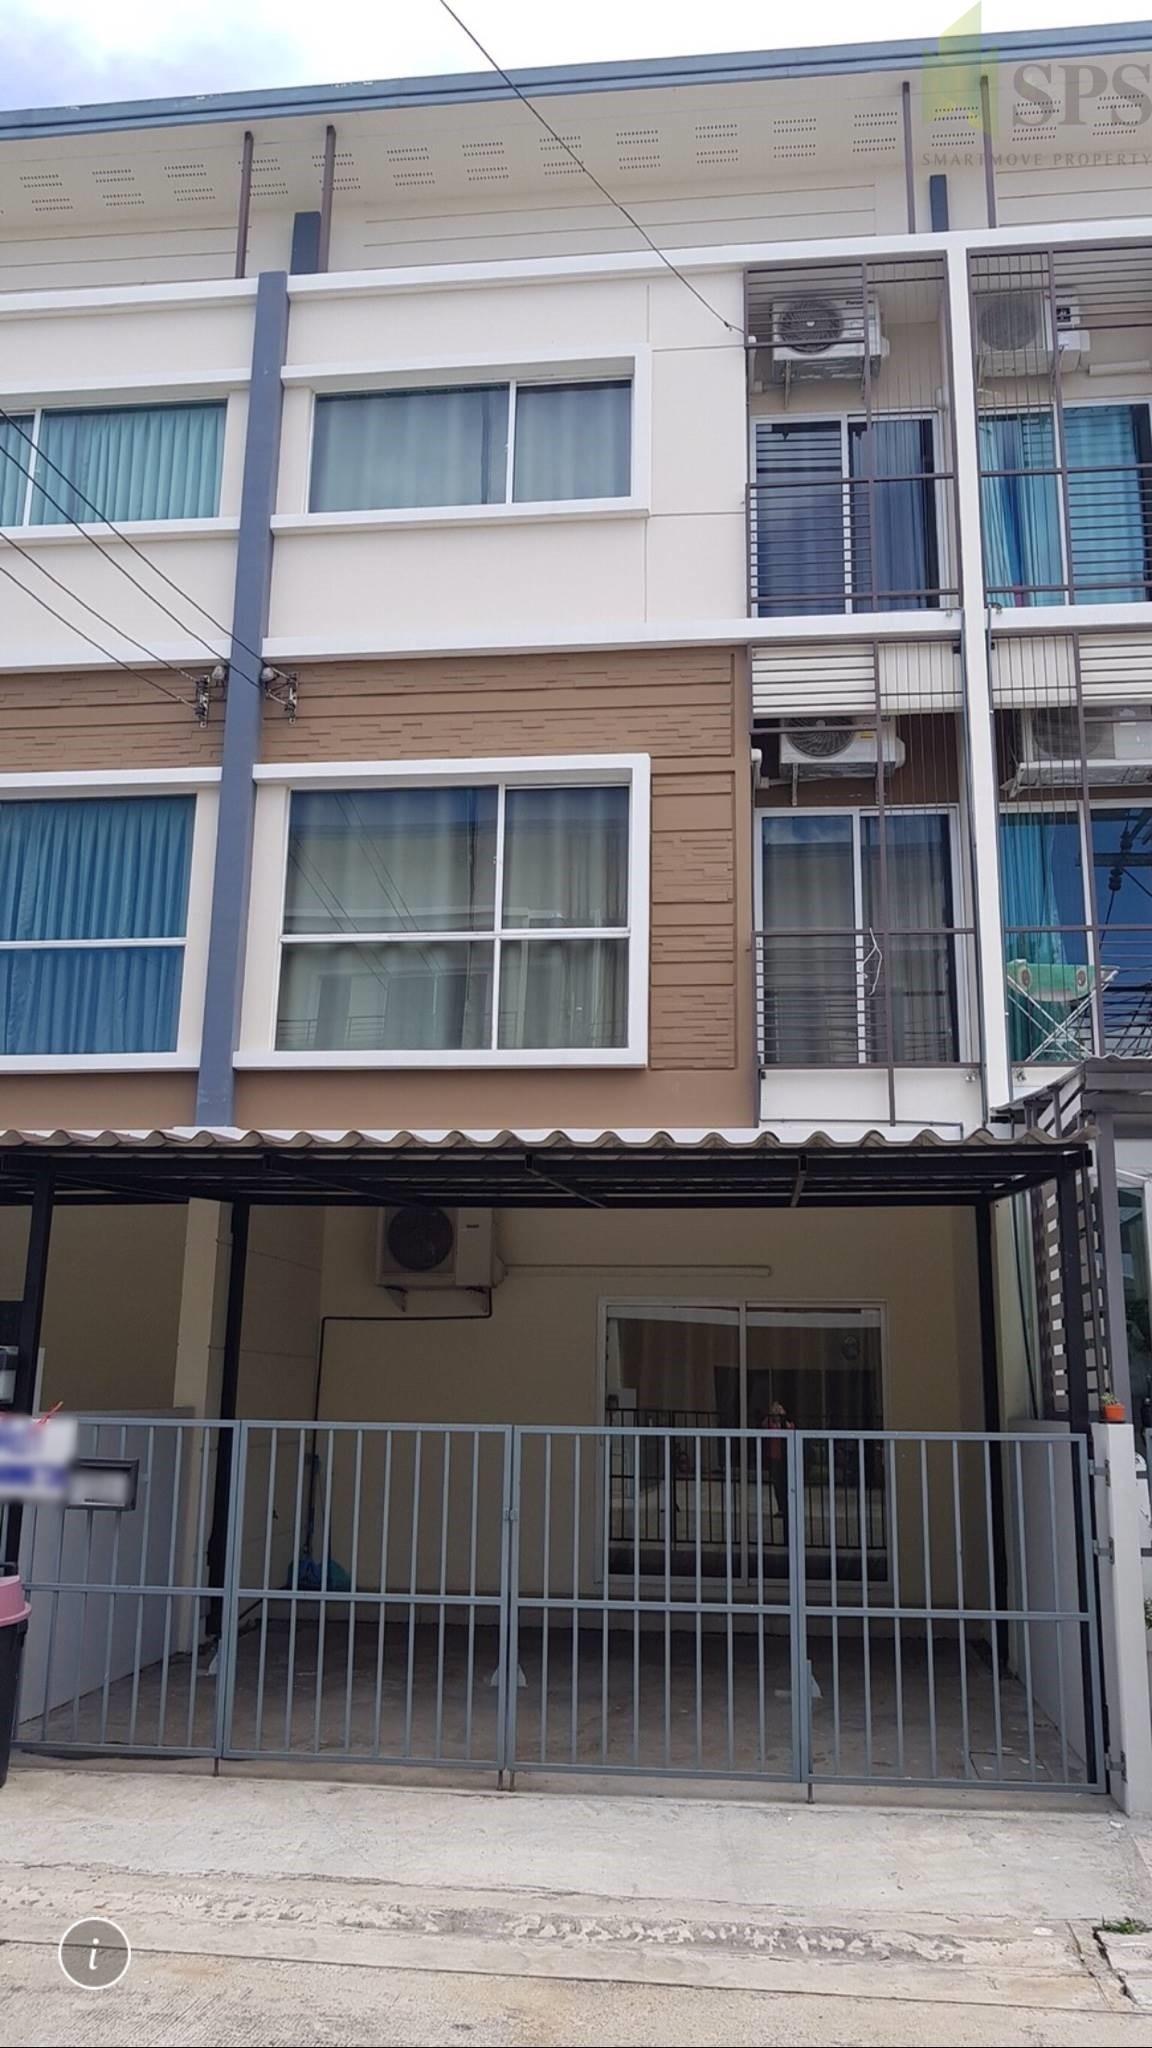 For Rent Town Home Villette City Pattanakarn วิลเลต ซิตี้ พัฒนาการ(SPS-GH61)